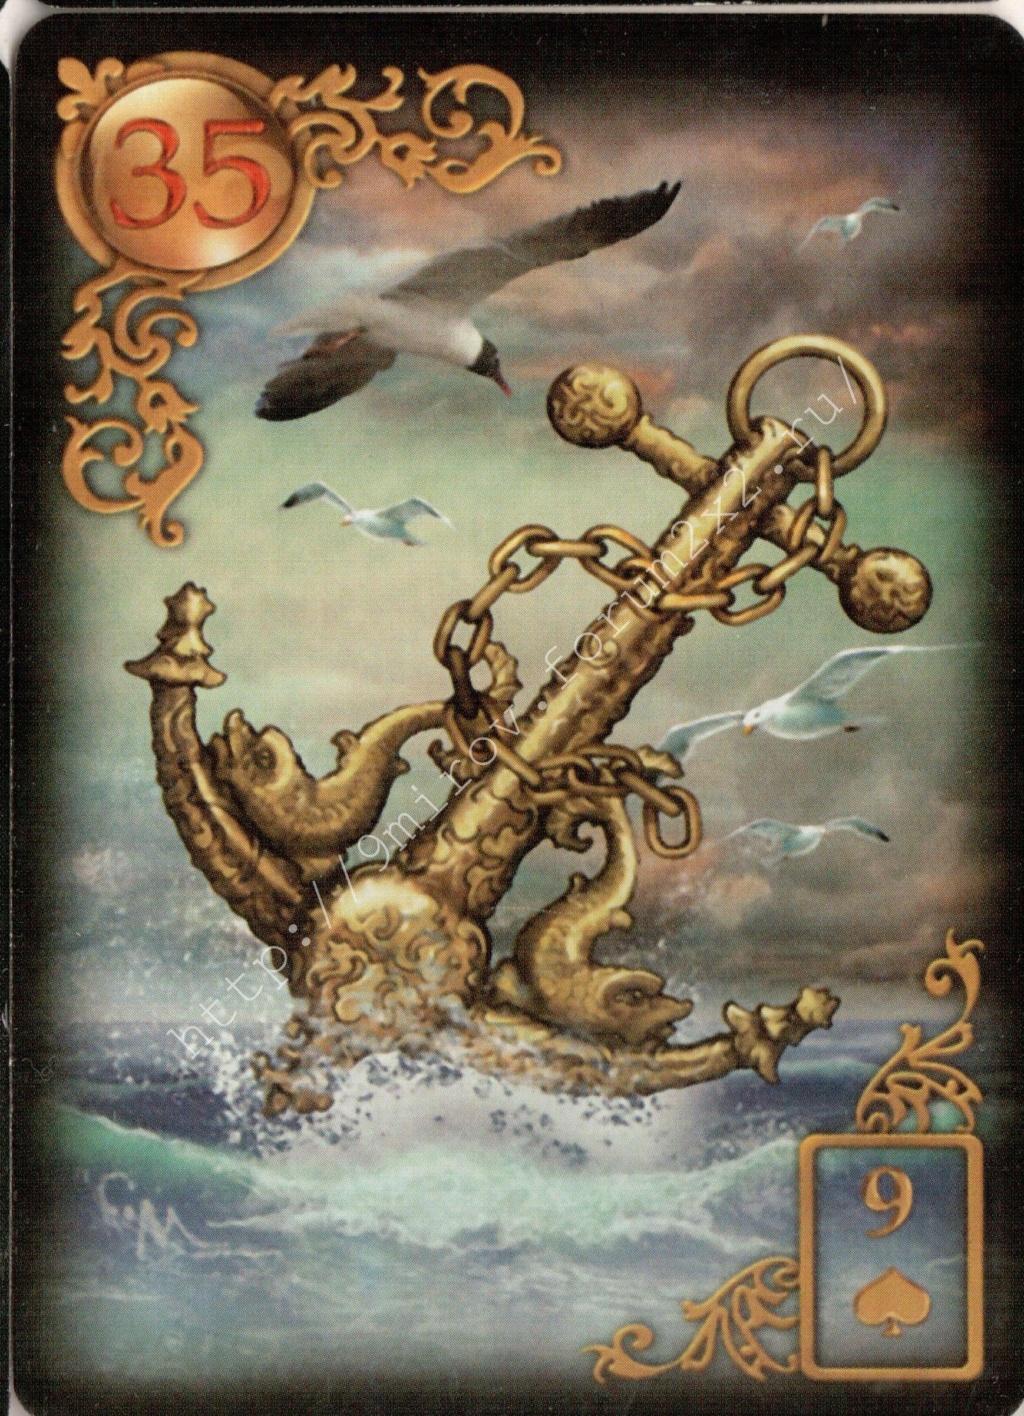 Золотые мечты Ленорман (Расширенное издание) | Gilded Reverie Lenormand. Галерея.  Water126